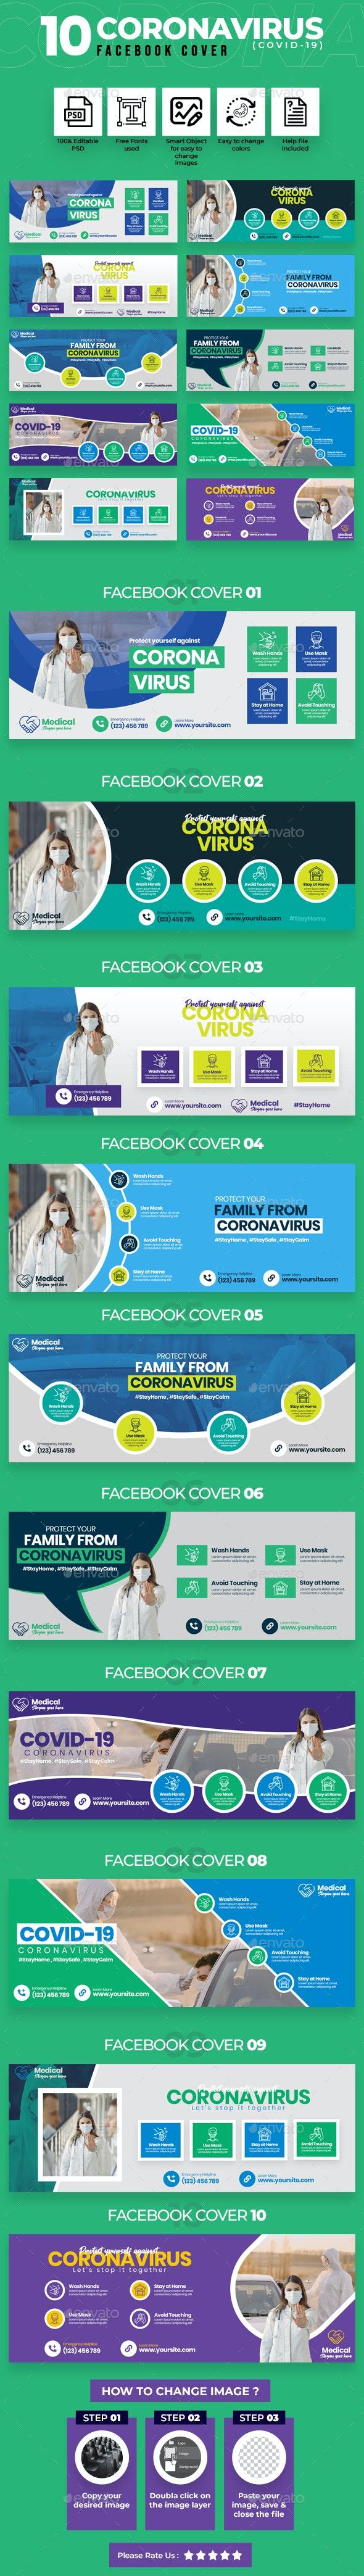 Covid-19 & Coronavirus 10 Facebook Cover - Facebook Timeline Covers Social Media